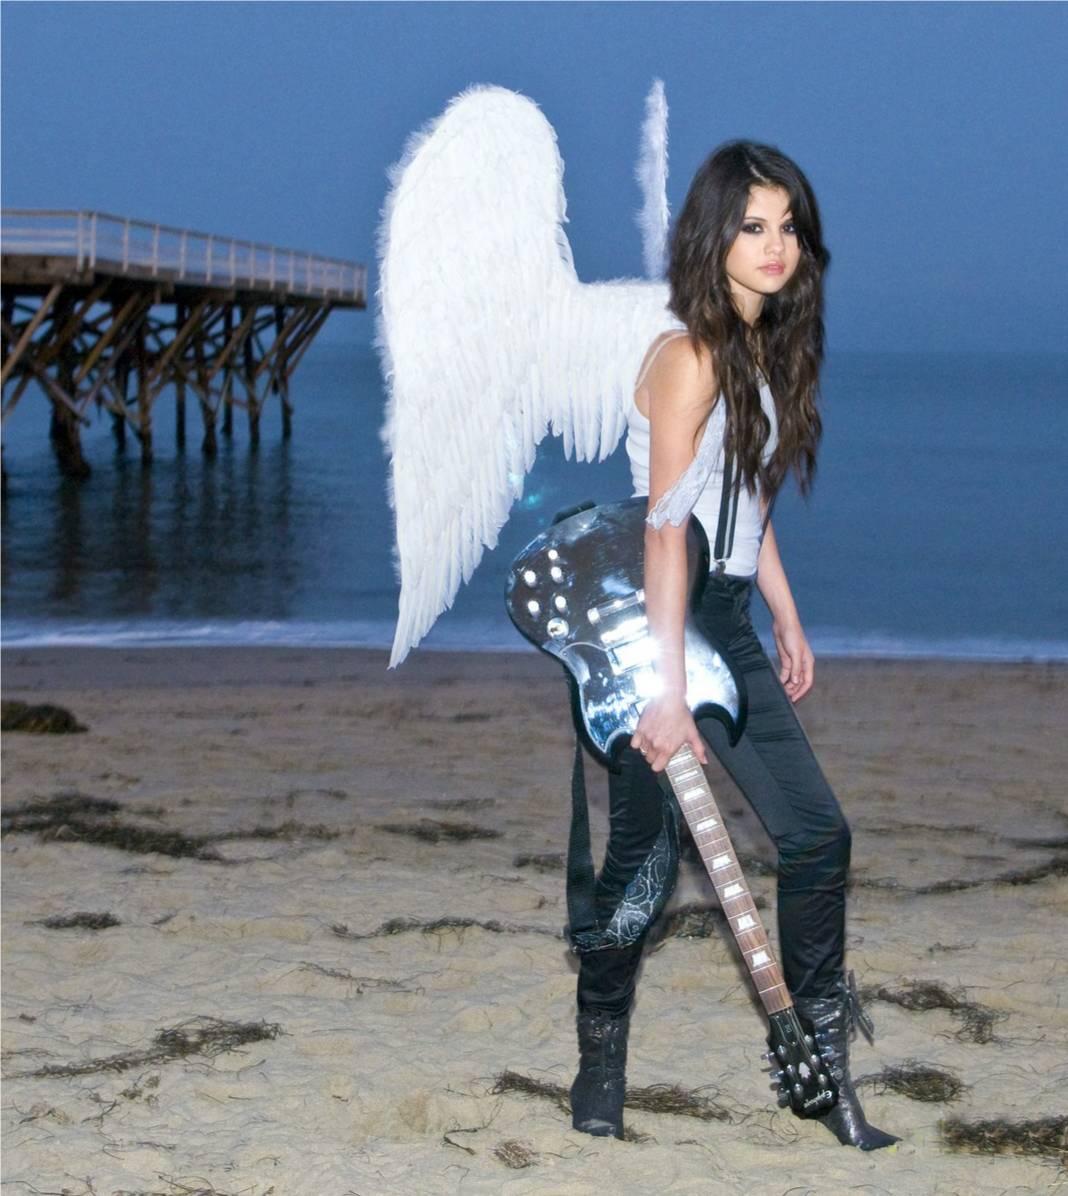 http://4.bp.blogspot.com/_BhMoCdsH2Fw/SIqBDCmbyUI/AAAAAAAAAvc/IzReRbuZL9w/s1600-R/selena-gomez-wings-05.jpg